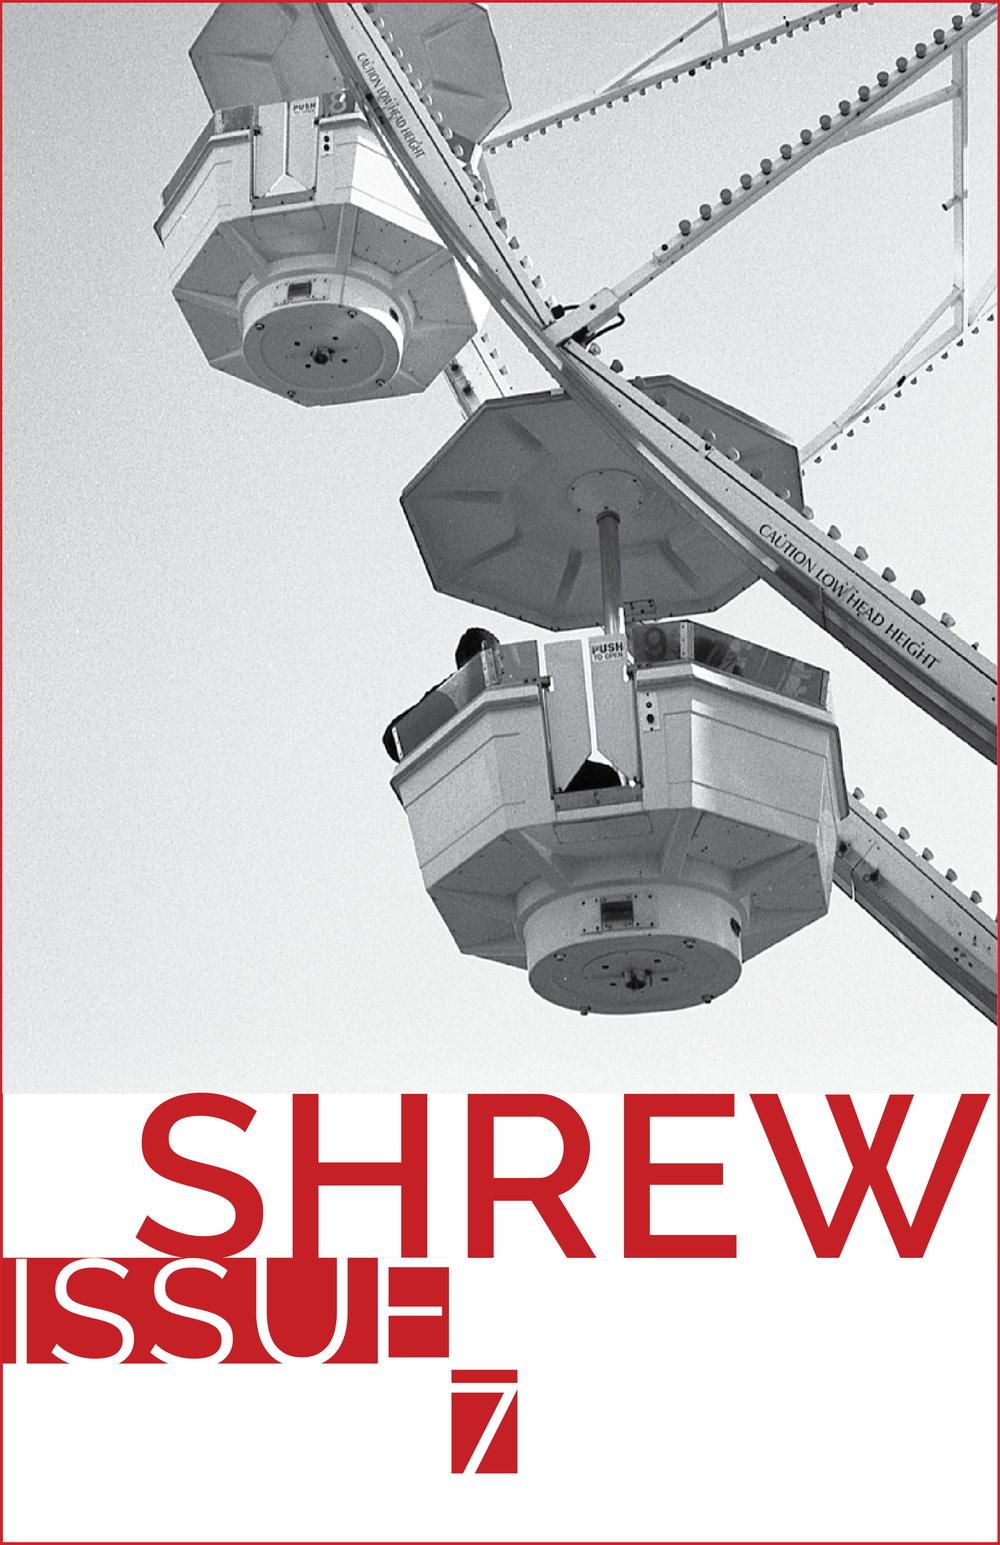 Shrew Issue 7.4-01.jpg